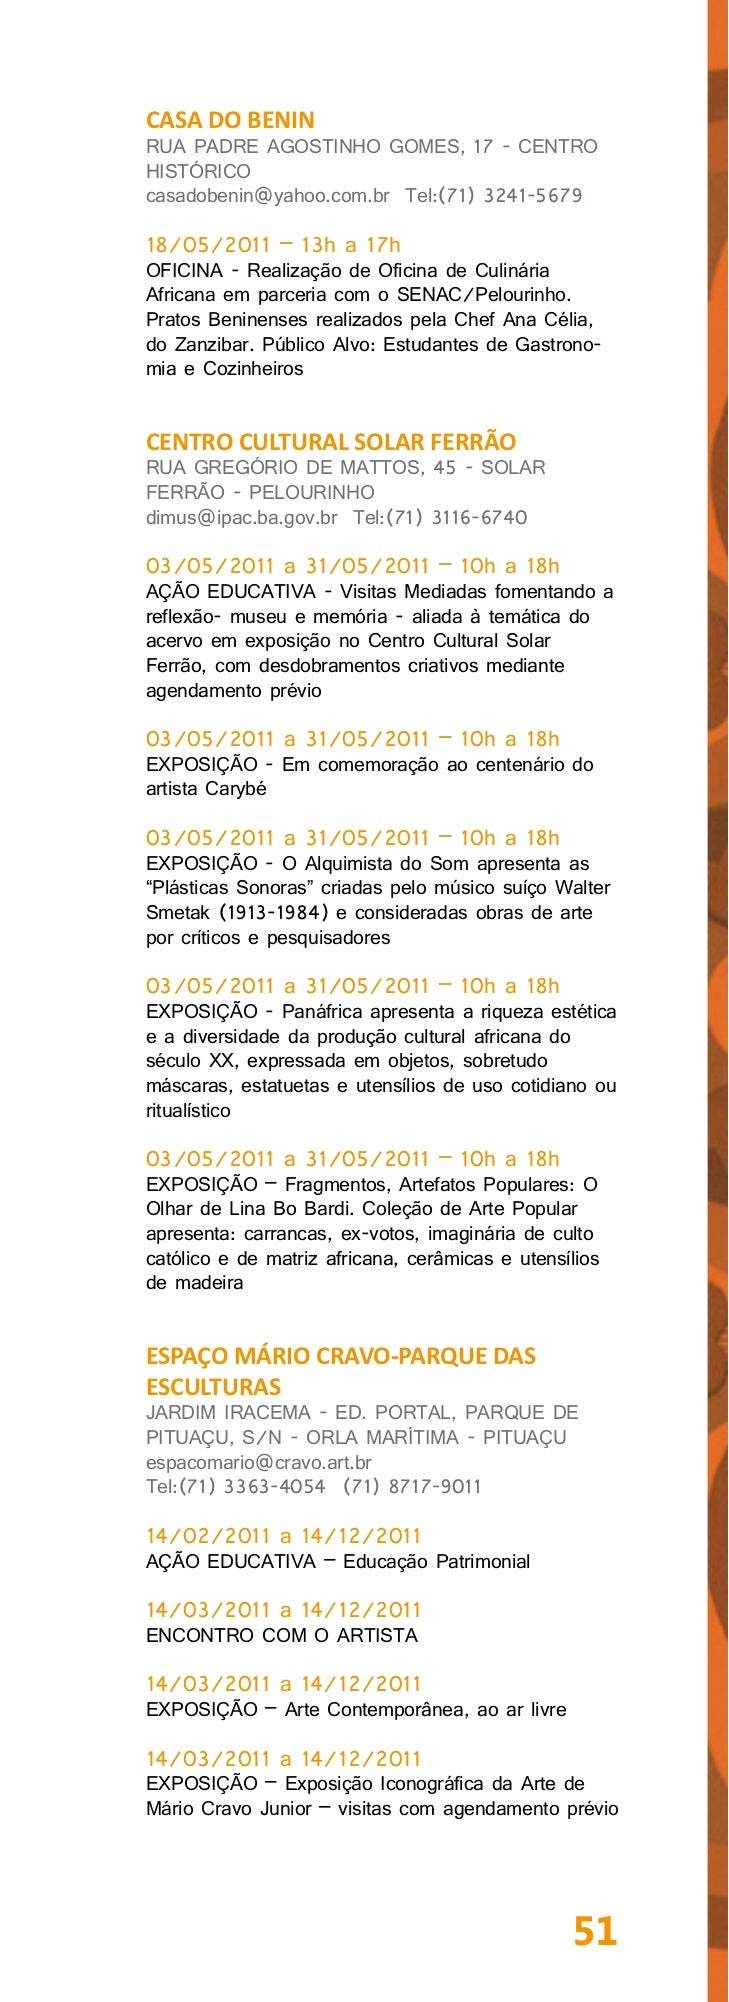 "14/03/2011 a 14/12/2011OFICINA – Com agendamento prévio: pintura,escultura, desenho.17/03/2011 a 17/12/2011CURSO – ""Desenv..."